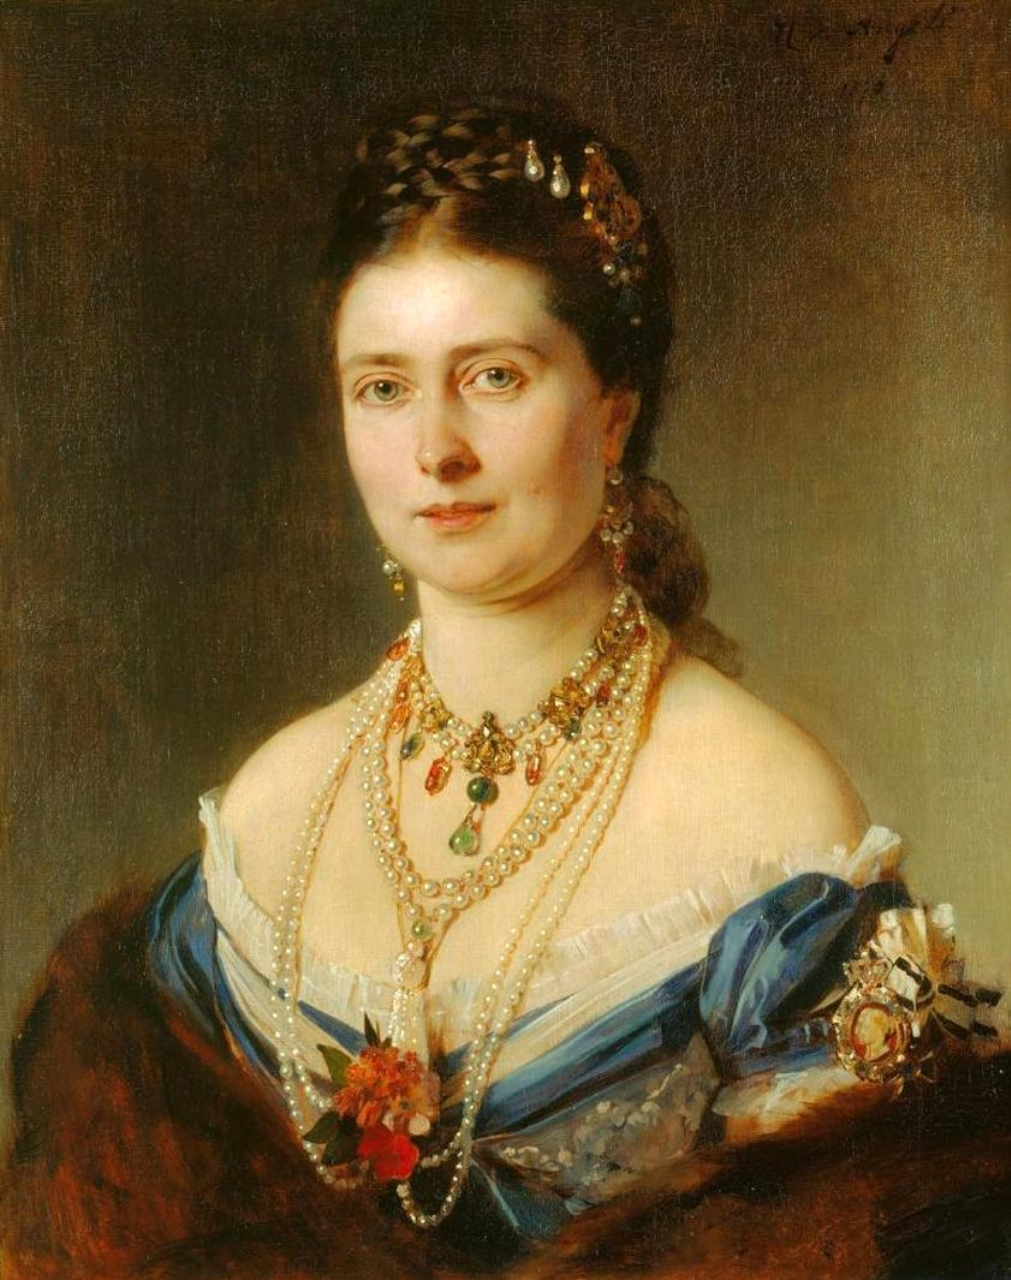 https://upload.wikimedia.org/wikipedia/commons/b/b8/Heinrich_von_Angeli_-_Victoria%2C_Princess_Royal%2C_1876.jpg